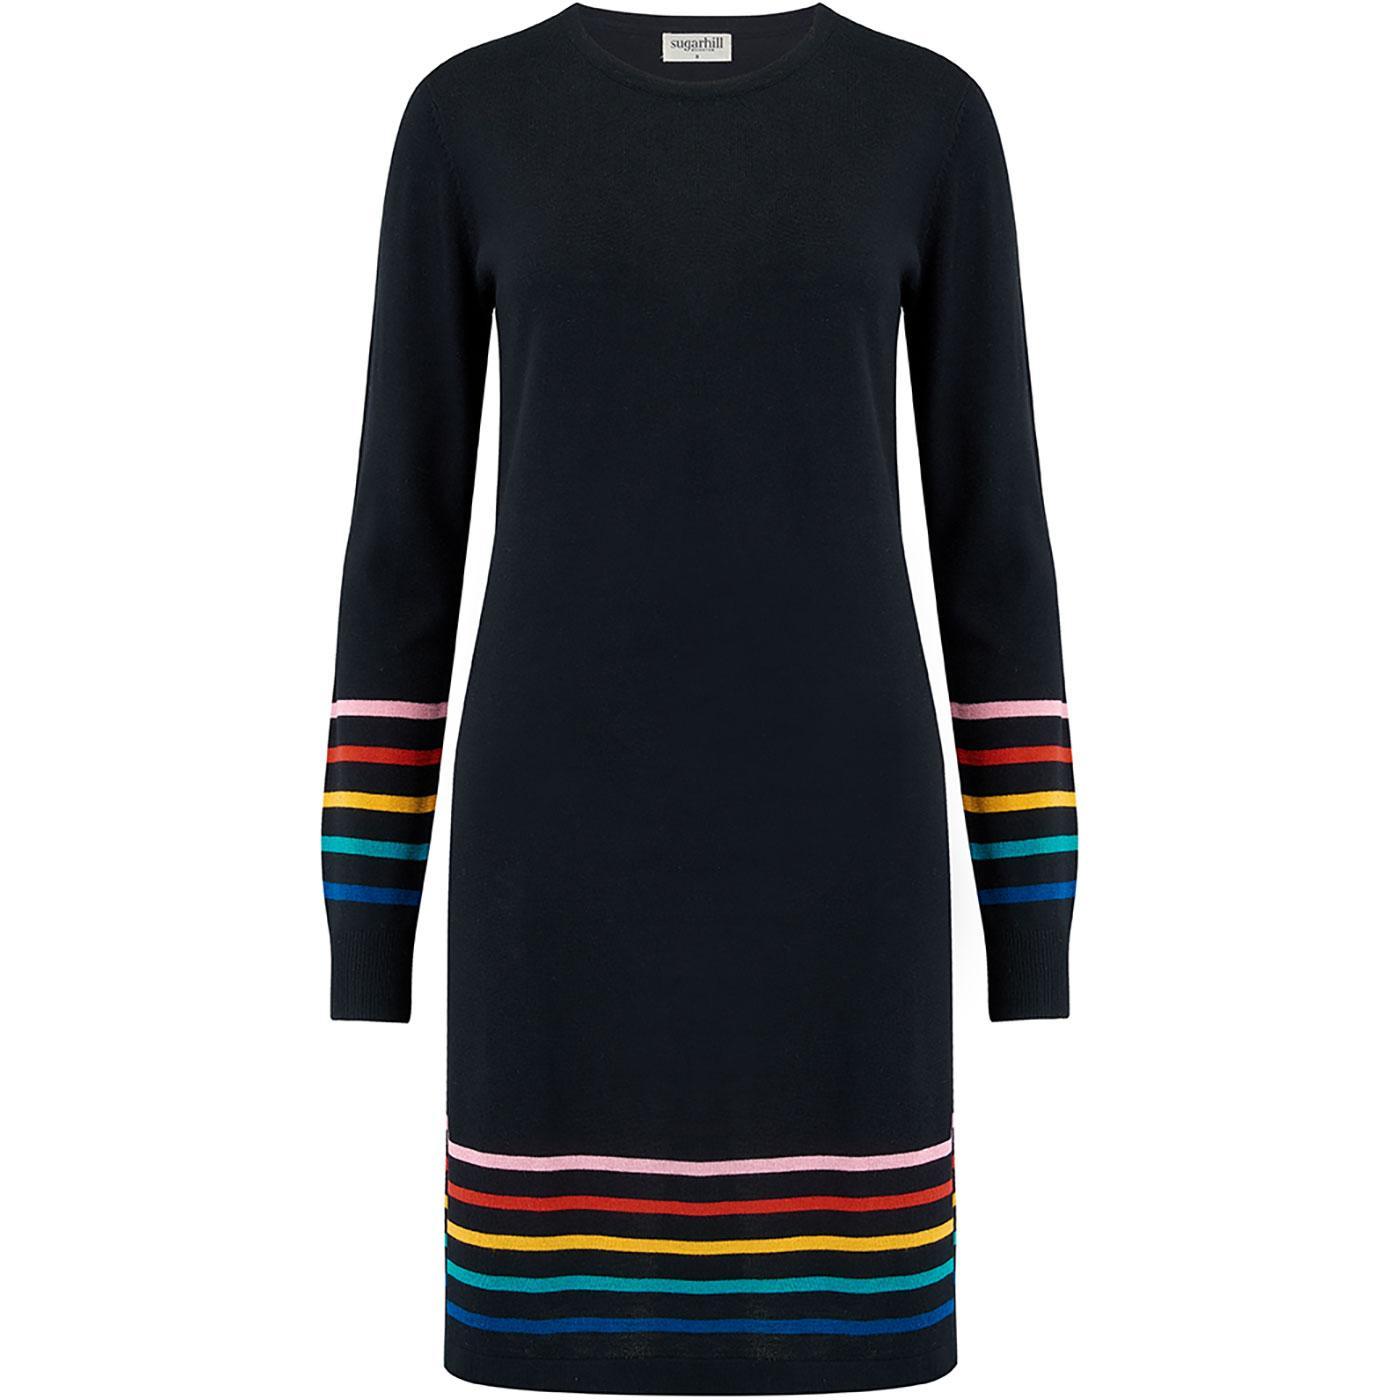 Evie SUGARHILL BRIGHTON Retro 70s Knitted Dress